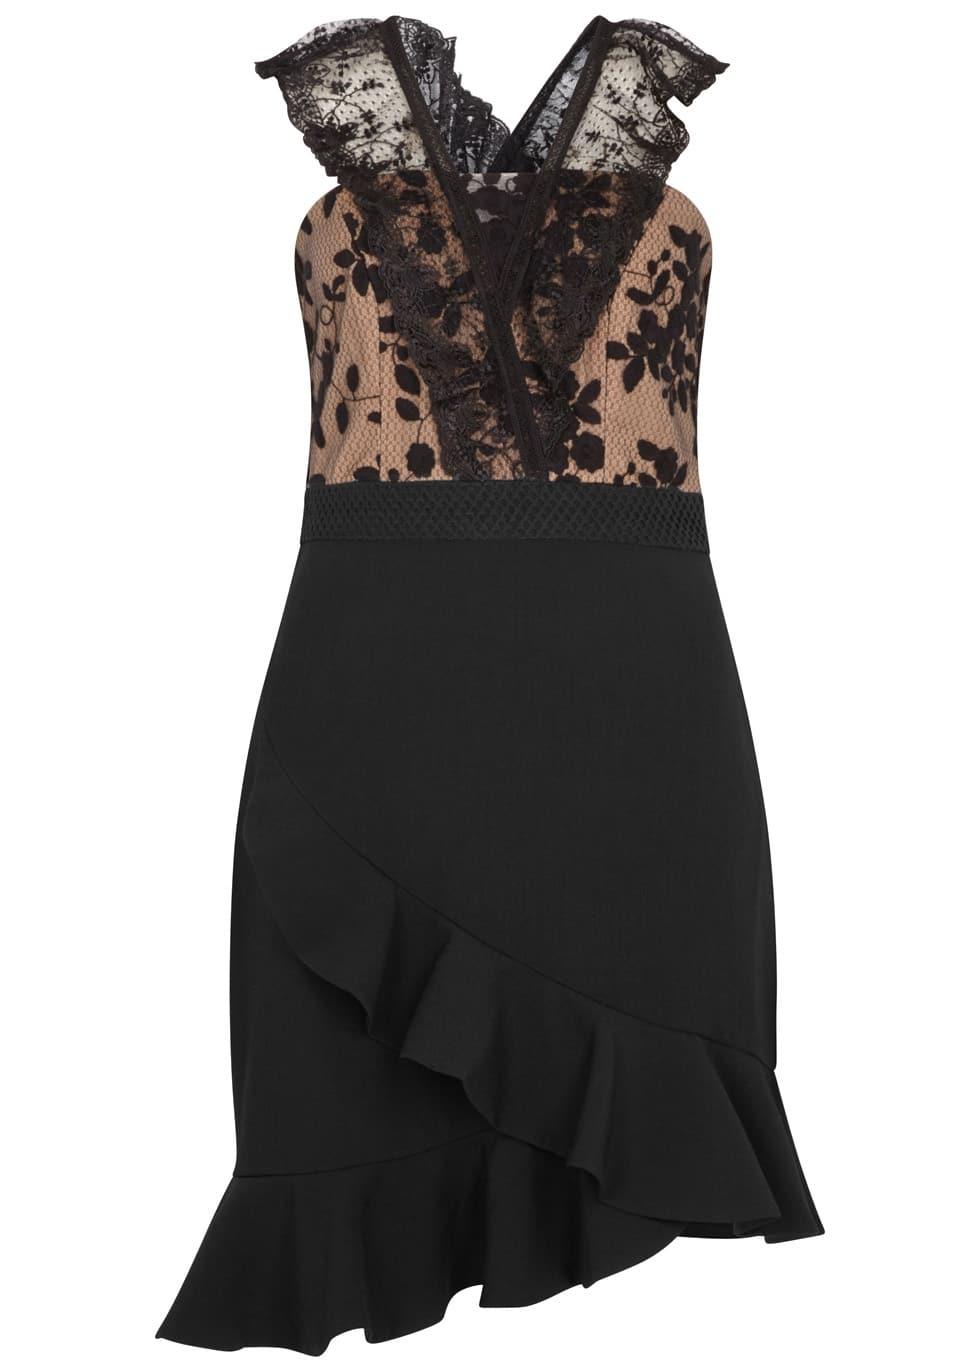 THREE FLOOR Ruffle Trimmed Black Dress